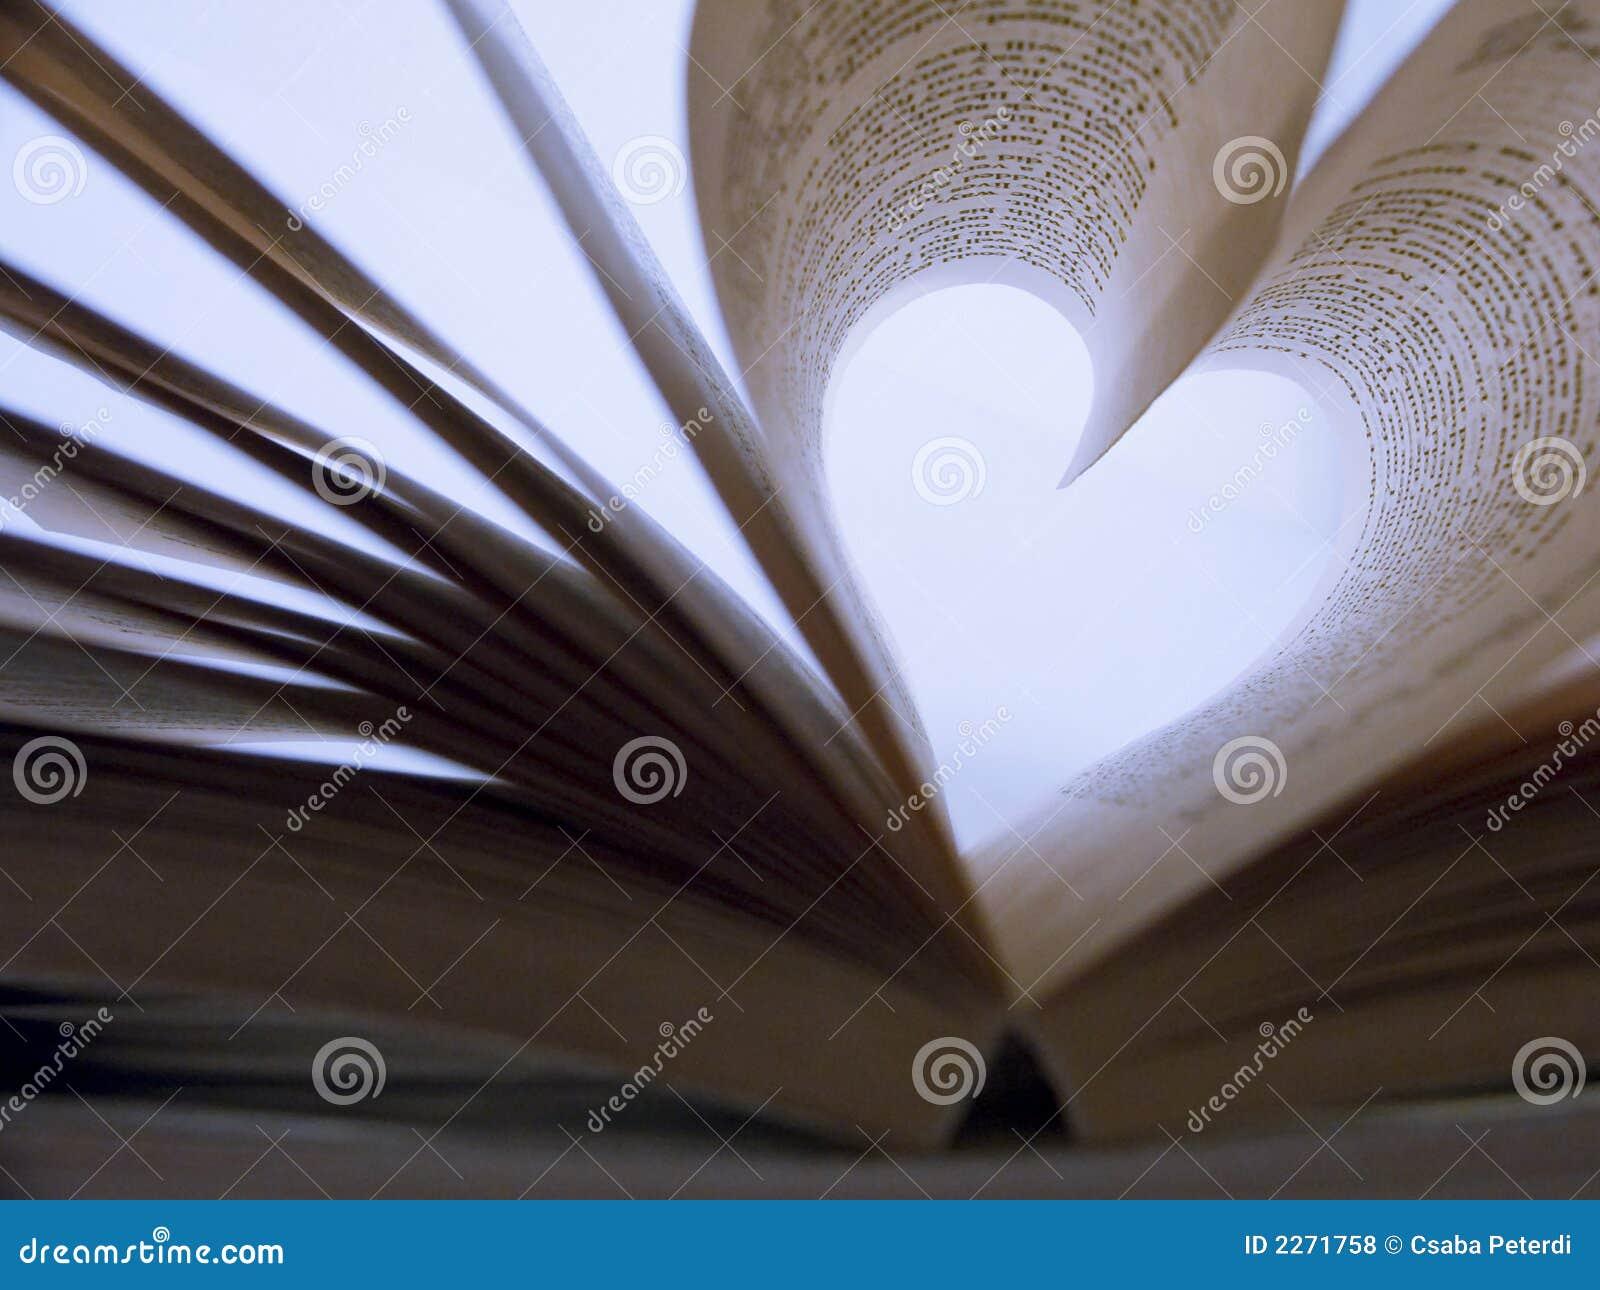 Heart shaped book